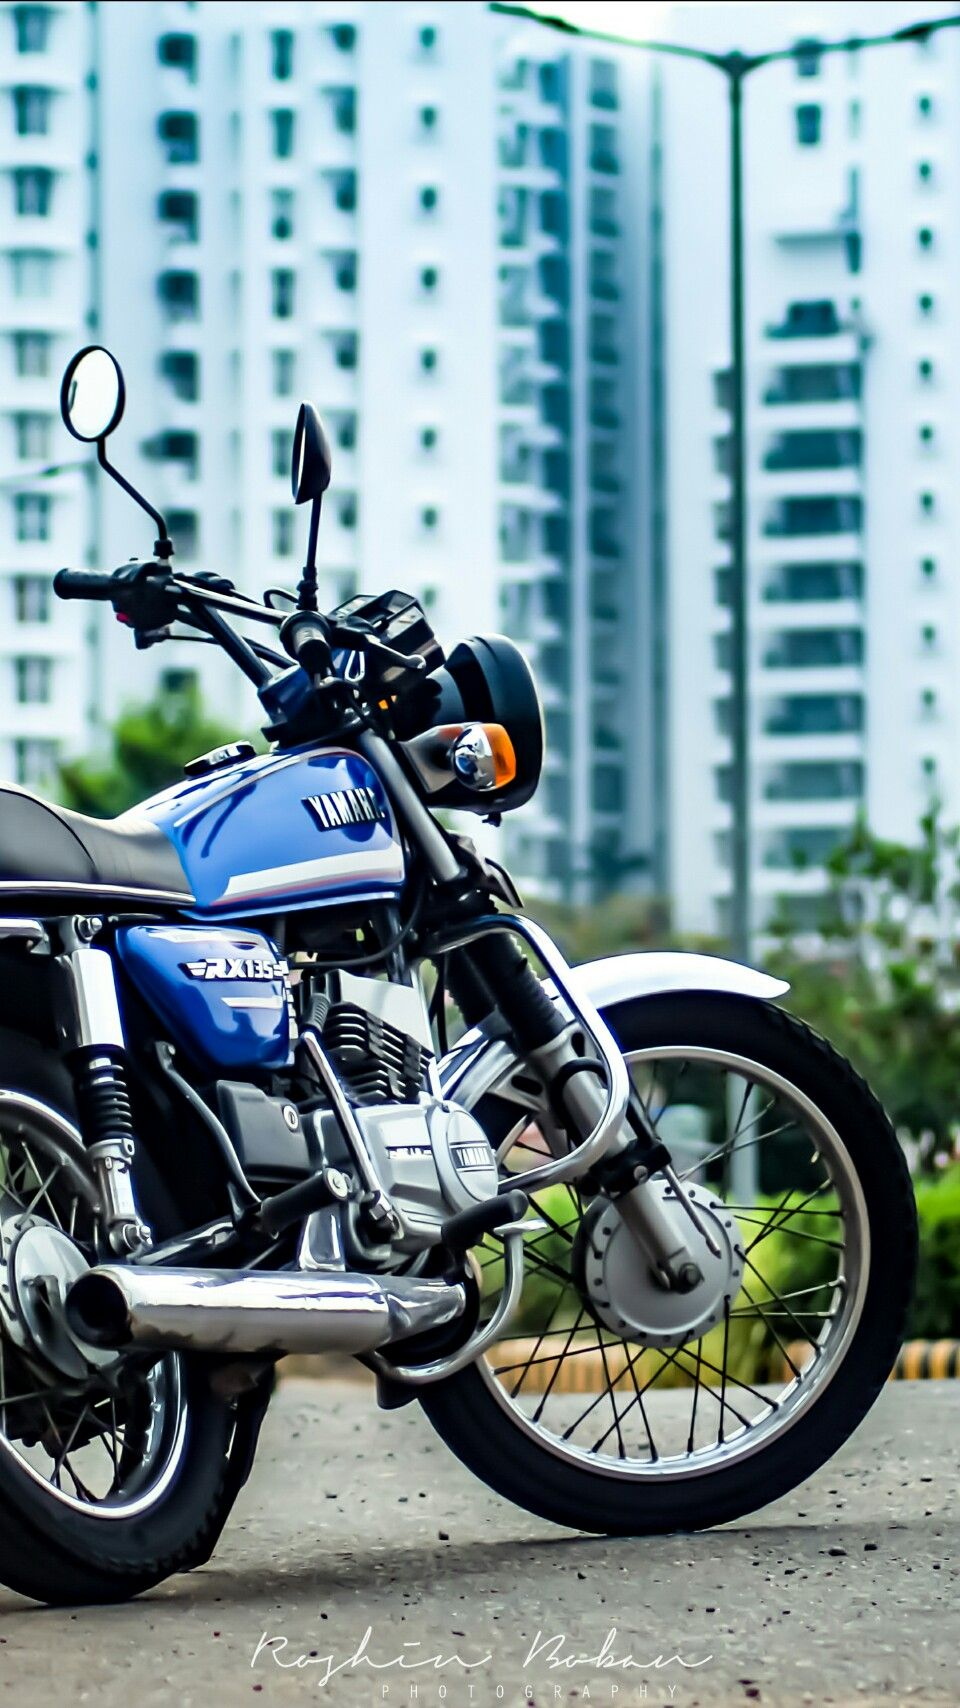 Yamaha RX 100 Wallpaper